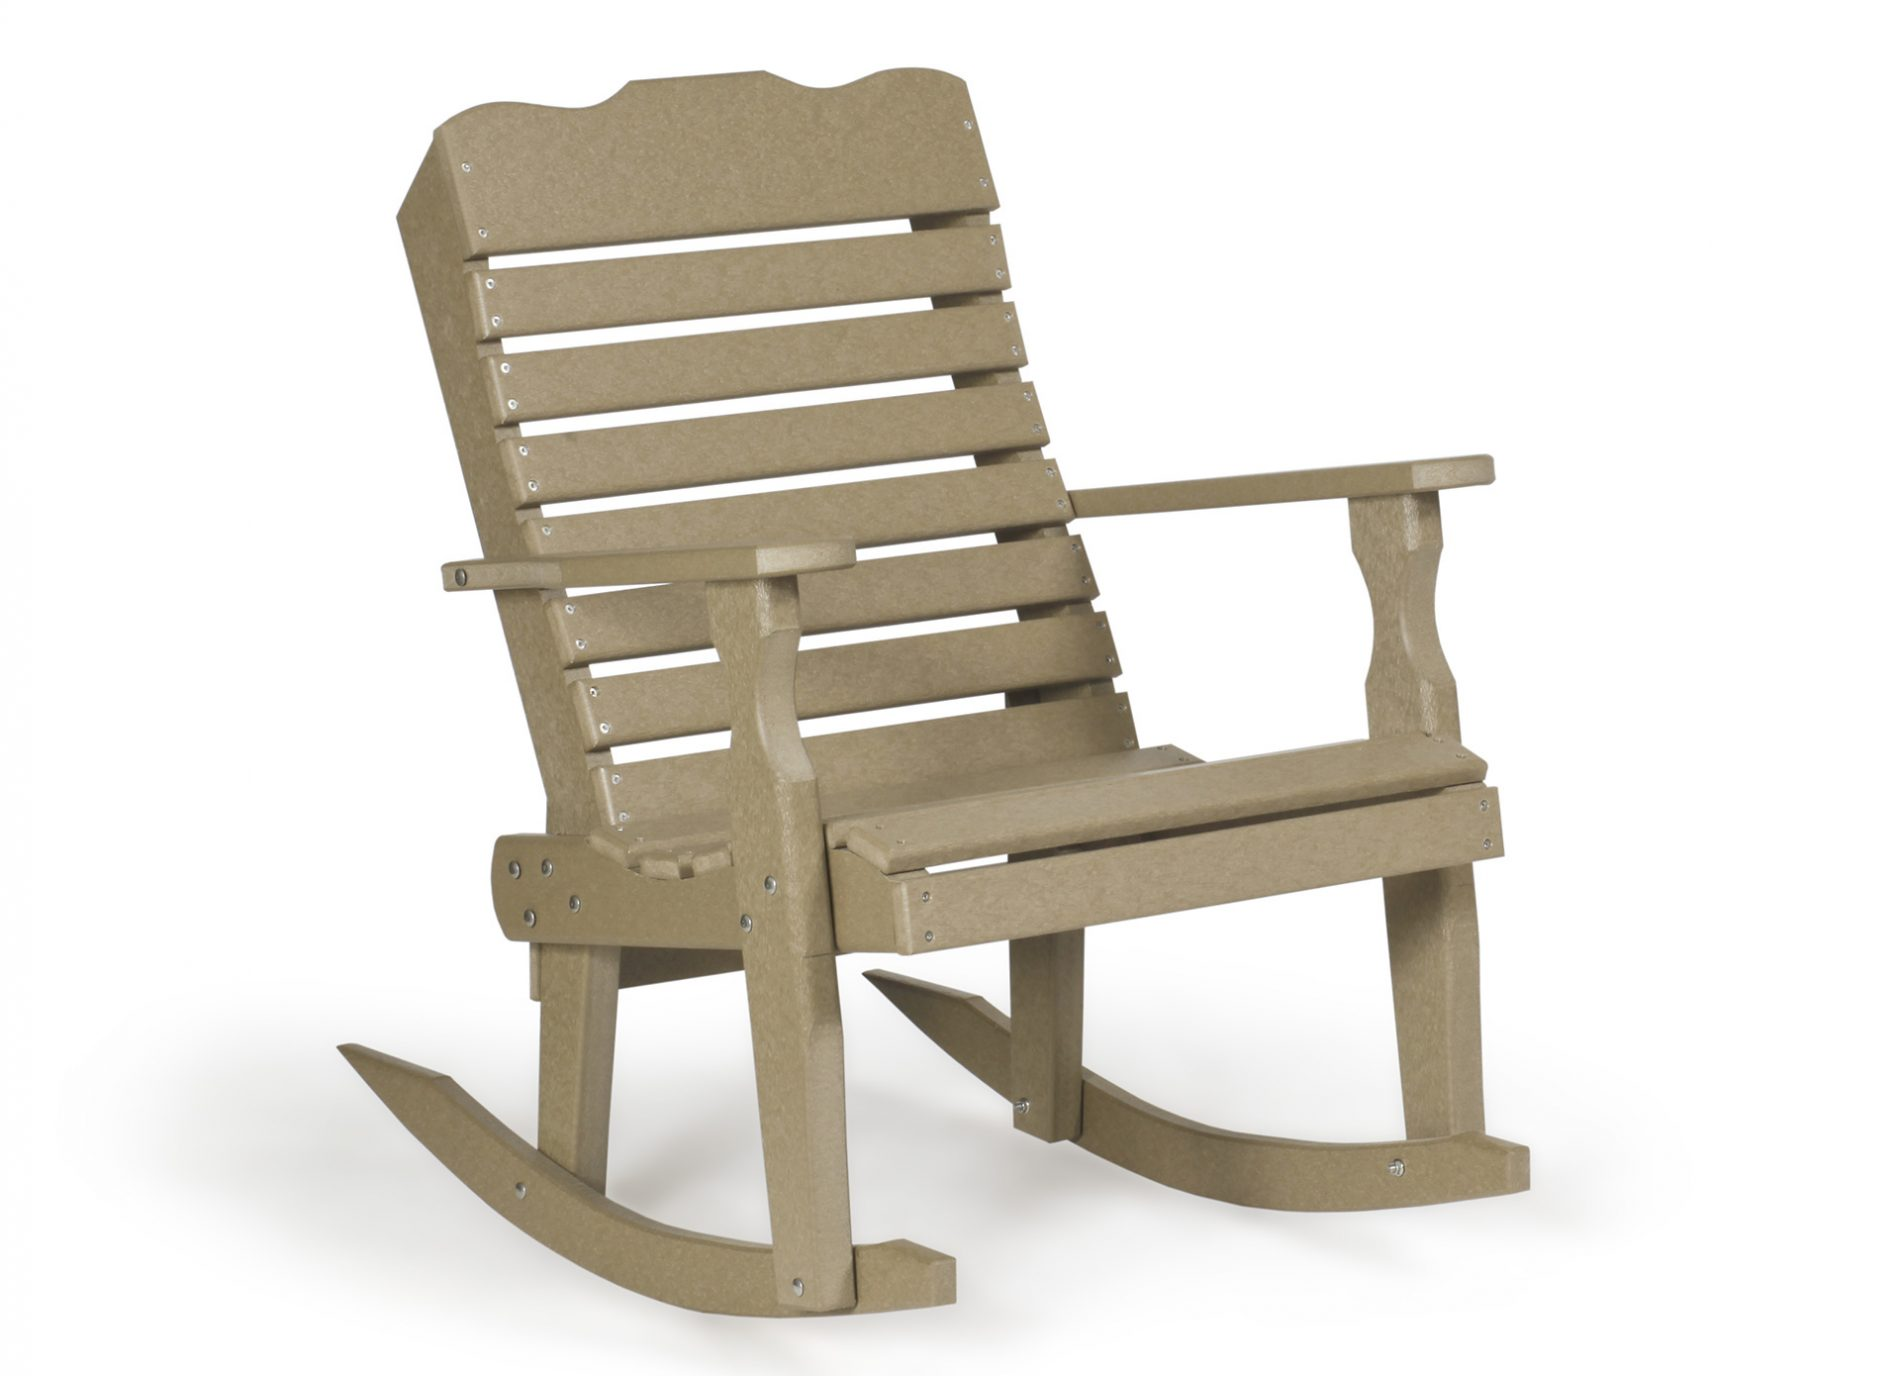 Curve Back Rocker Poly Furniture For Cabins